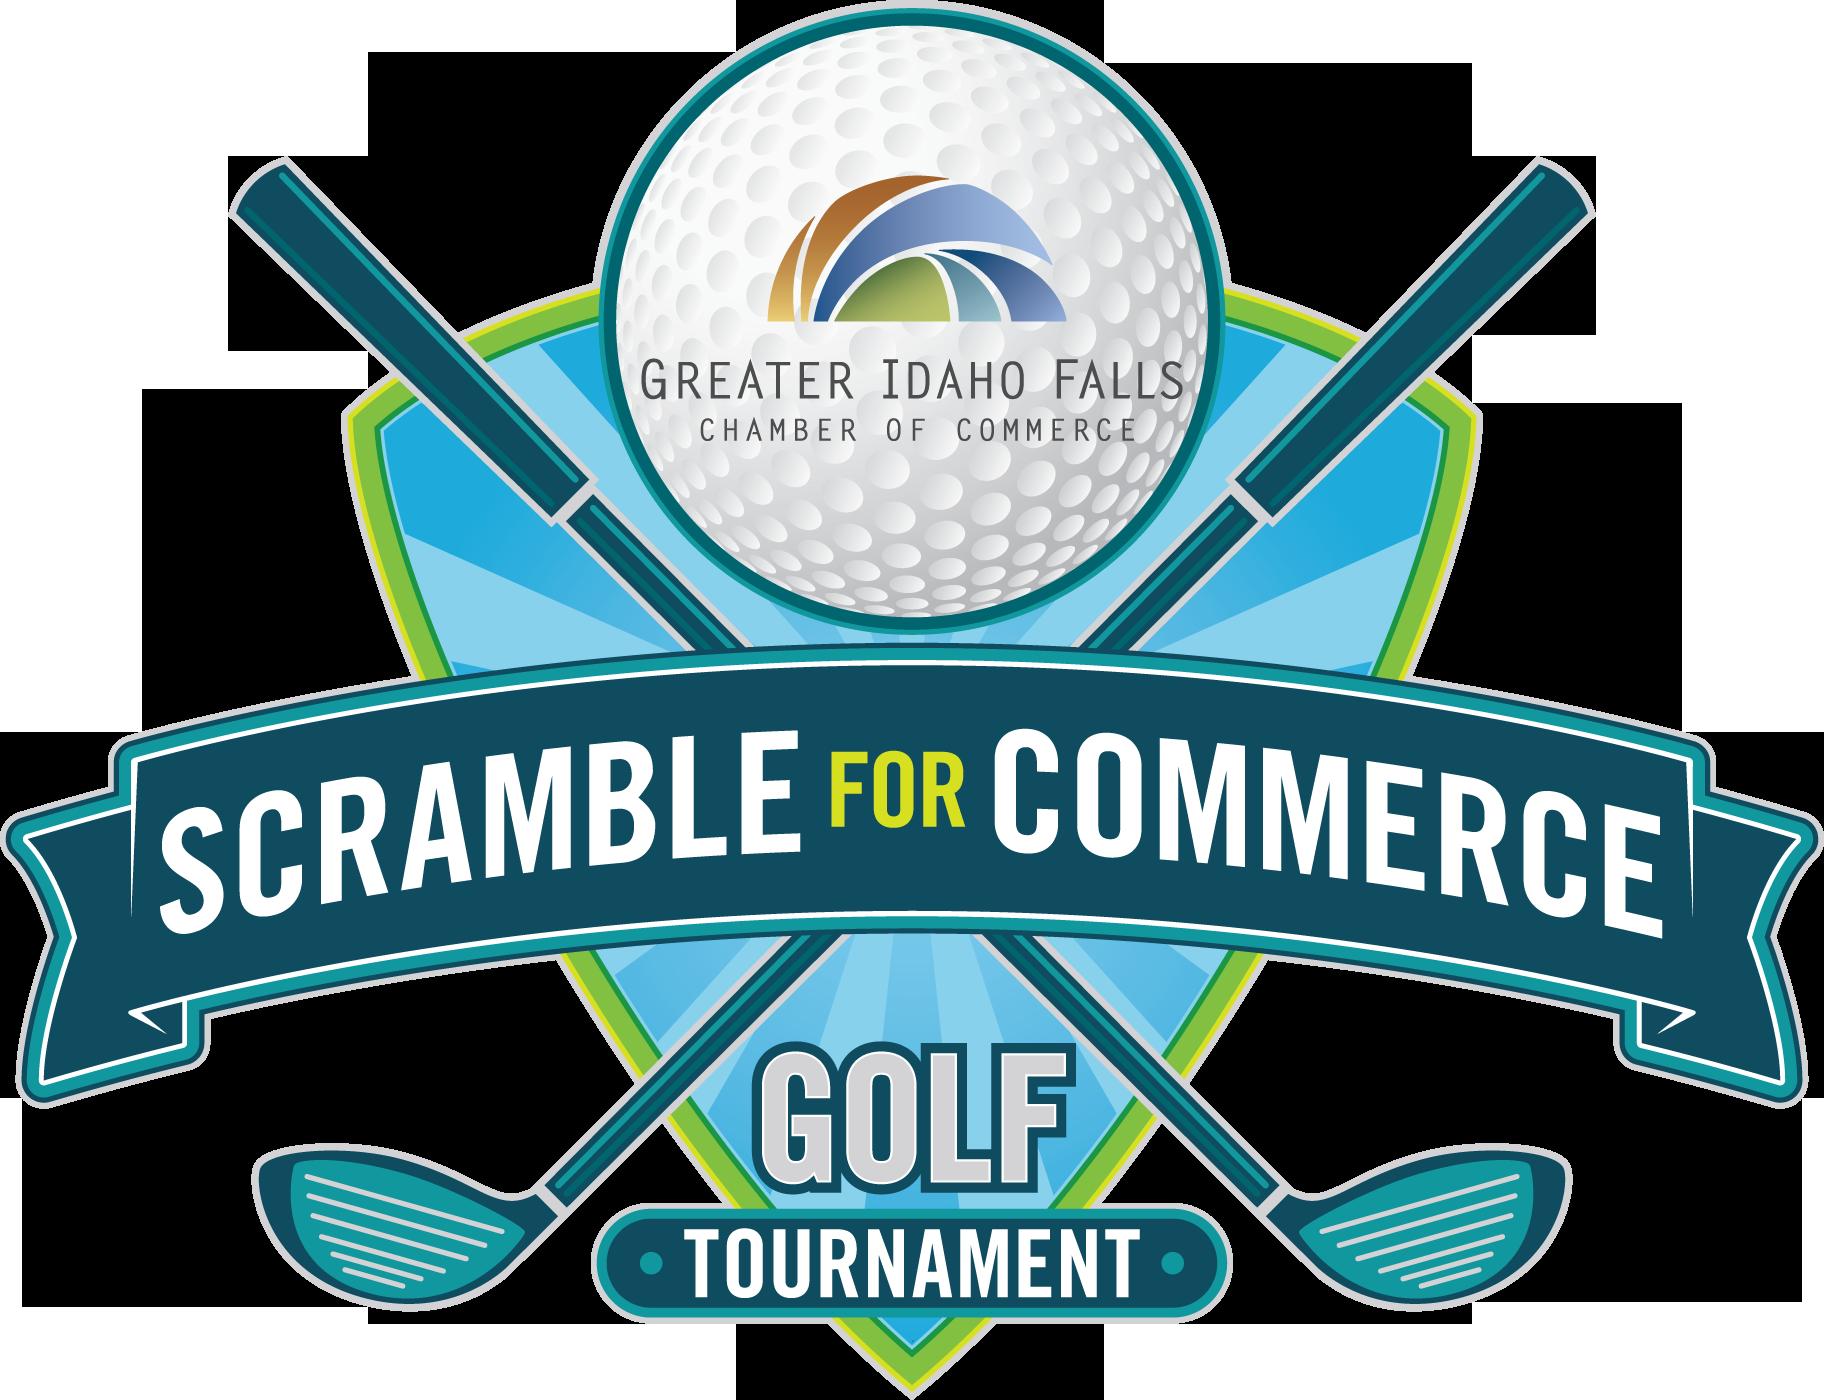 Golfer clipart golf scramble. For commerce tournament active